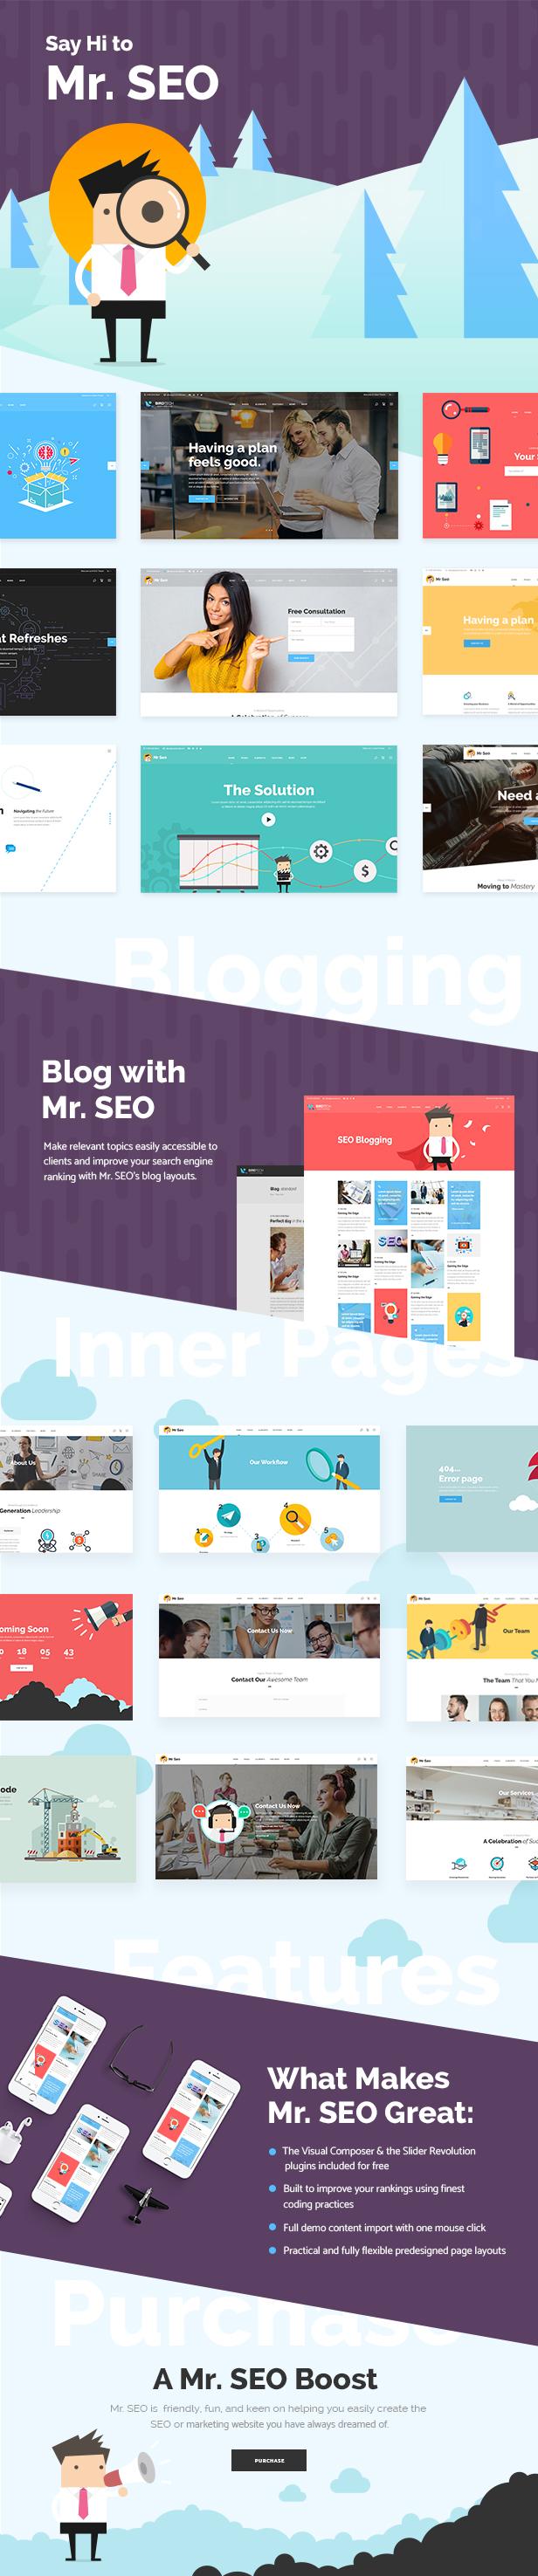 Mr. SEO - A Friendly SEO, Marketing Agency, and Social Media Theme 1